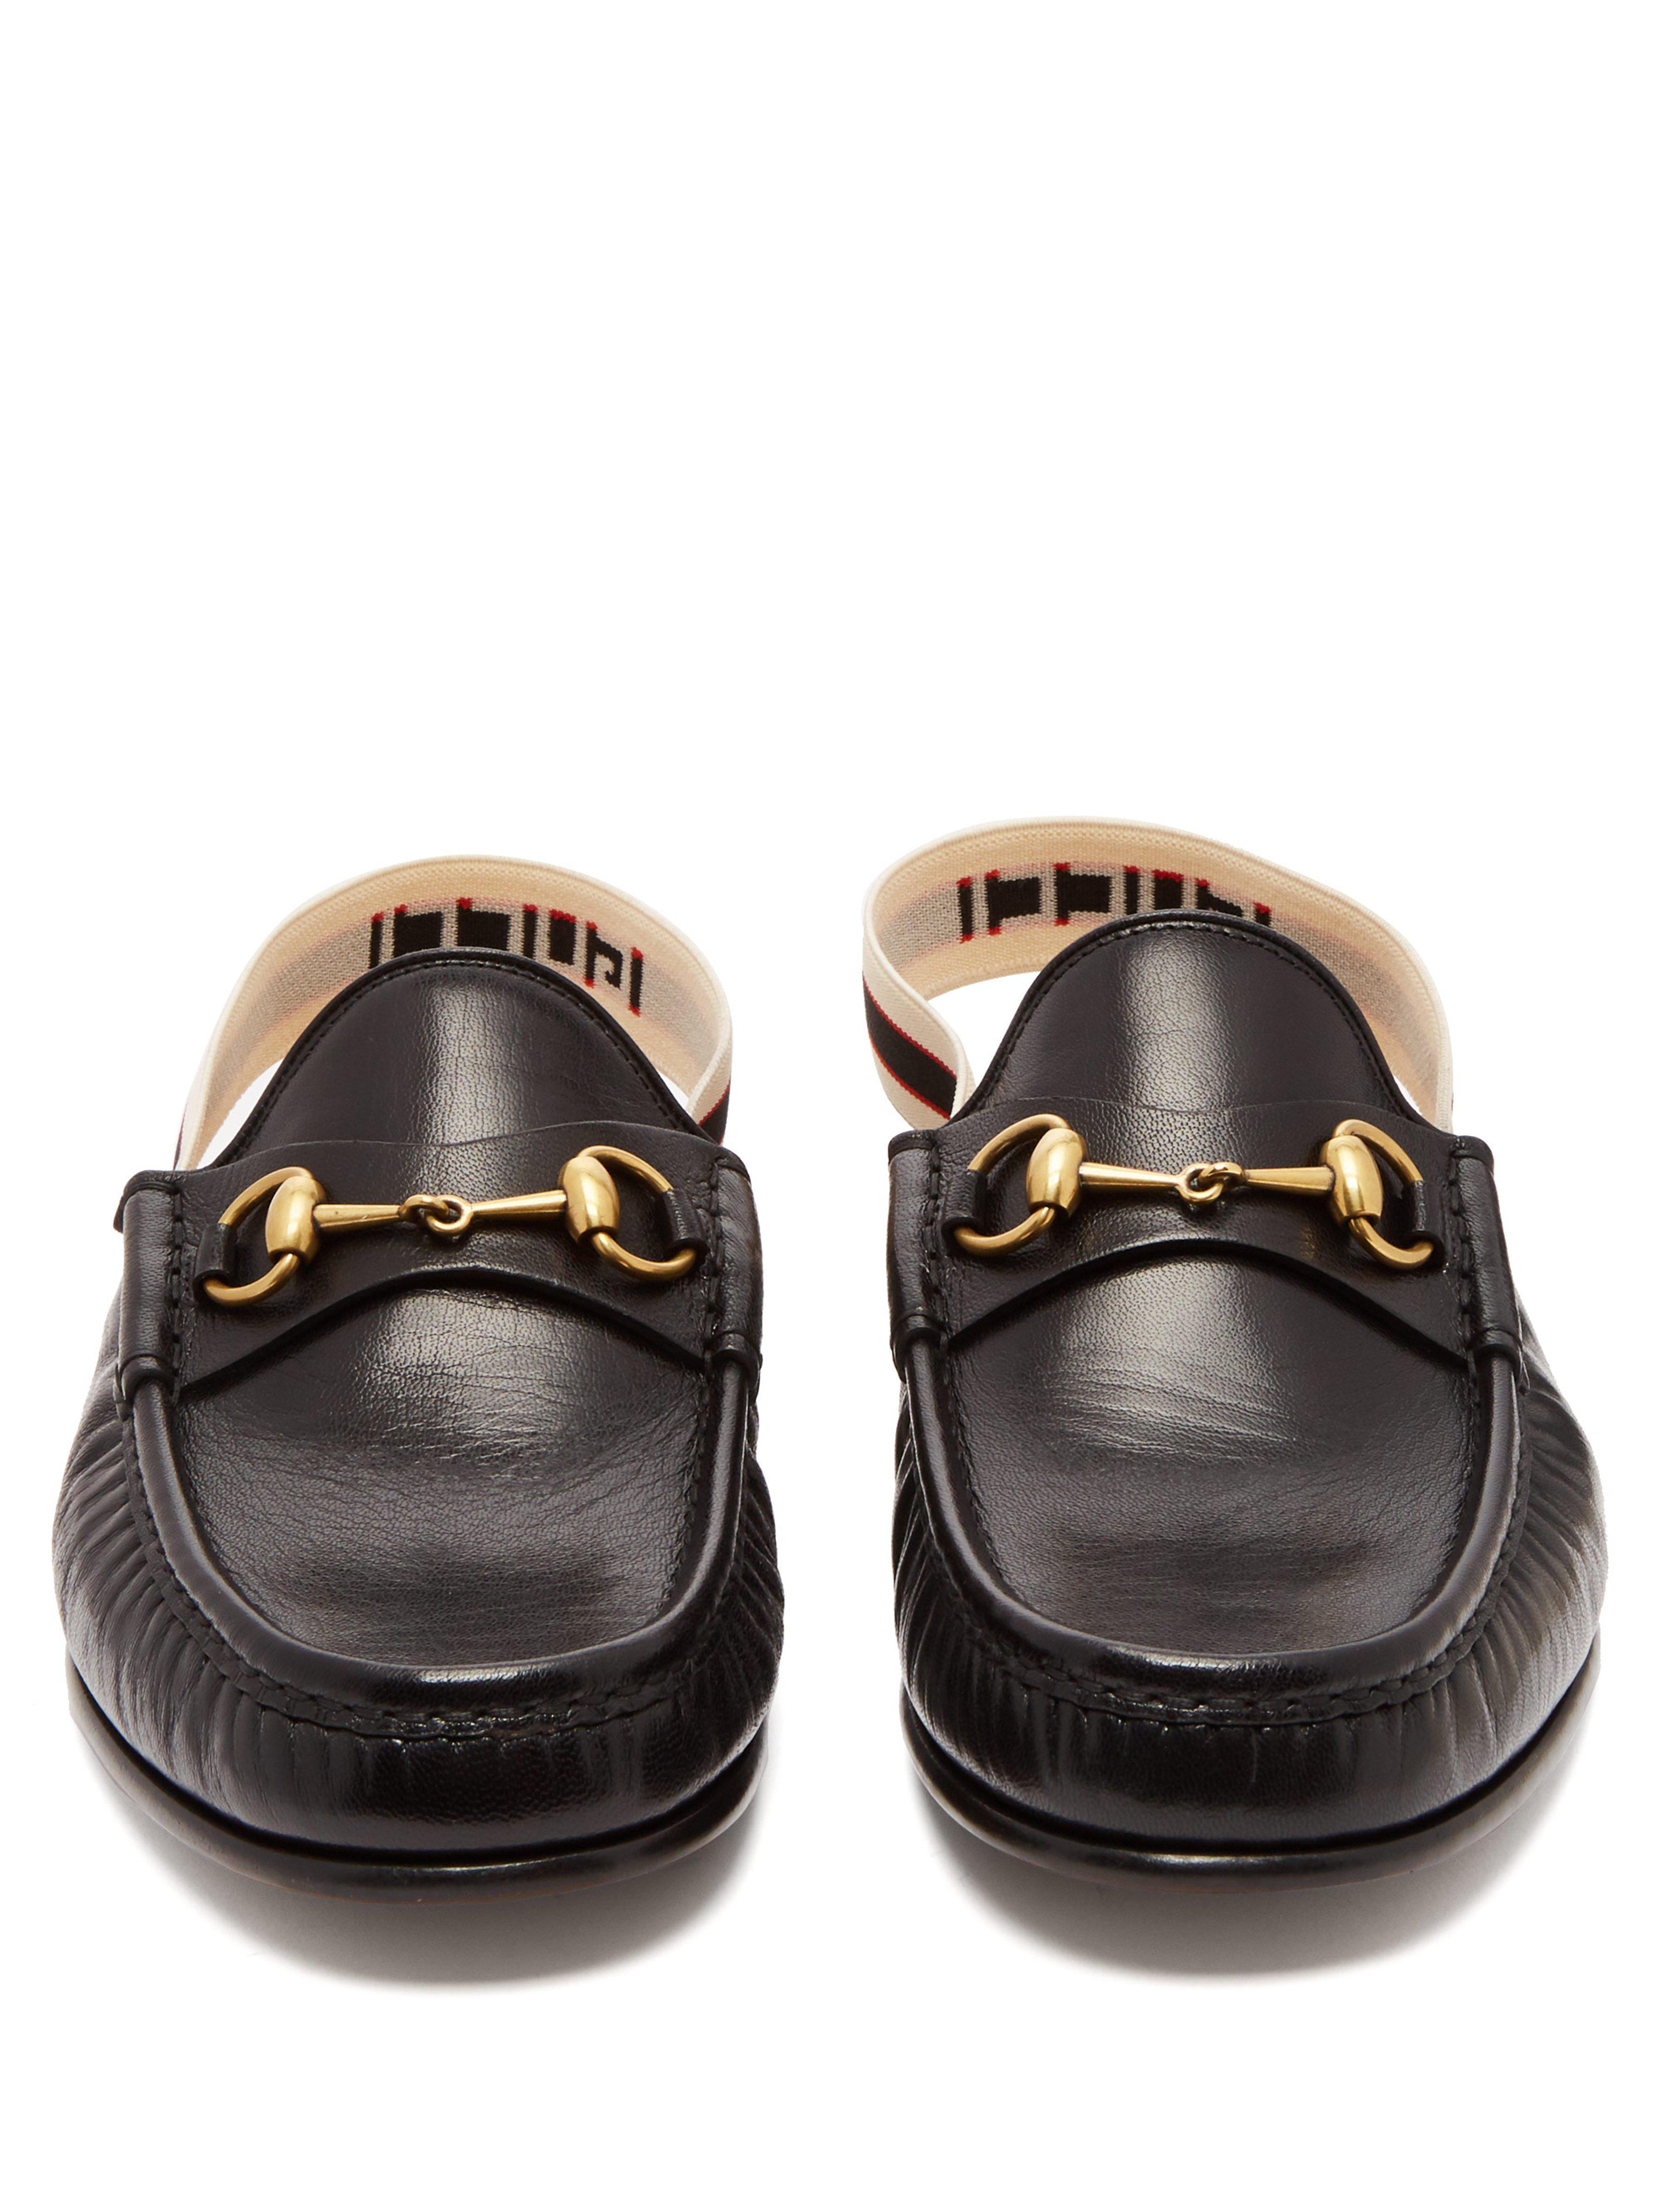 baa0ac0ac Gucci - Black Horsebit Slingback Strap Backless Leather Loafers for Men -  Lyst. View fullscreen